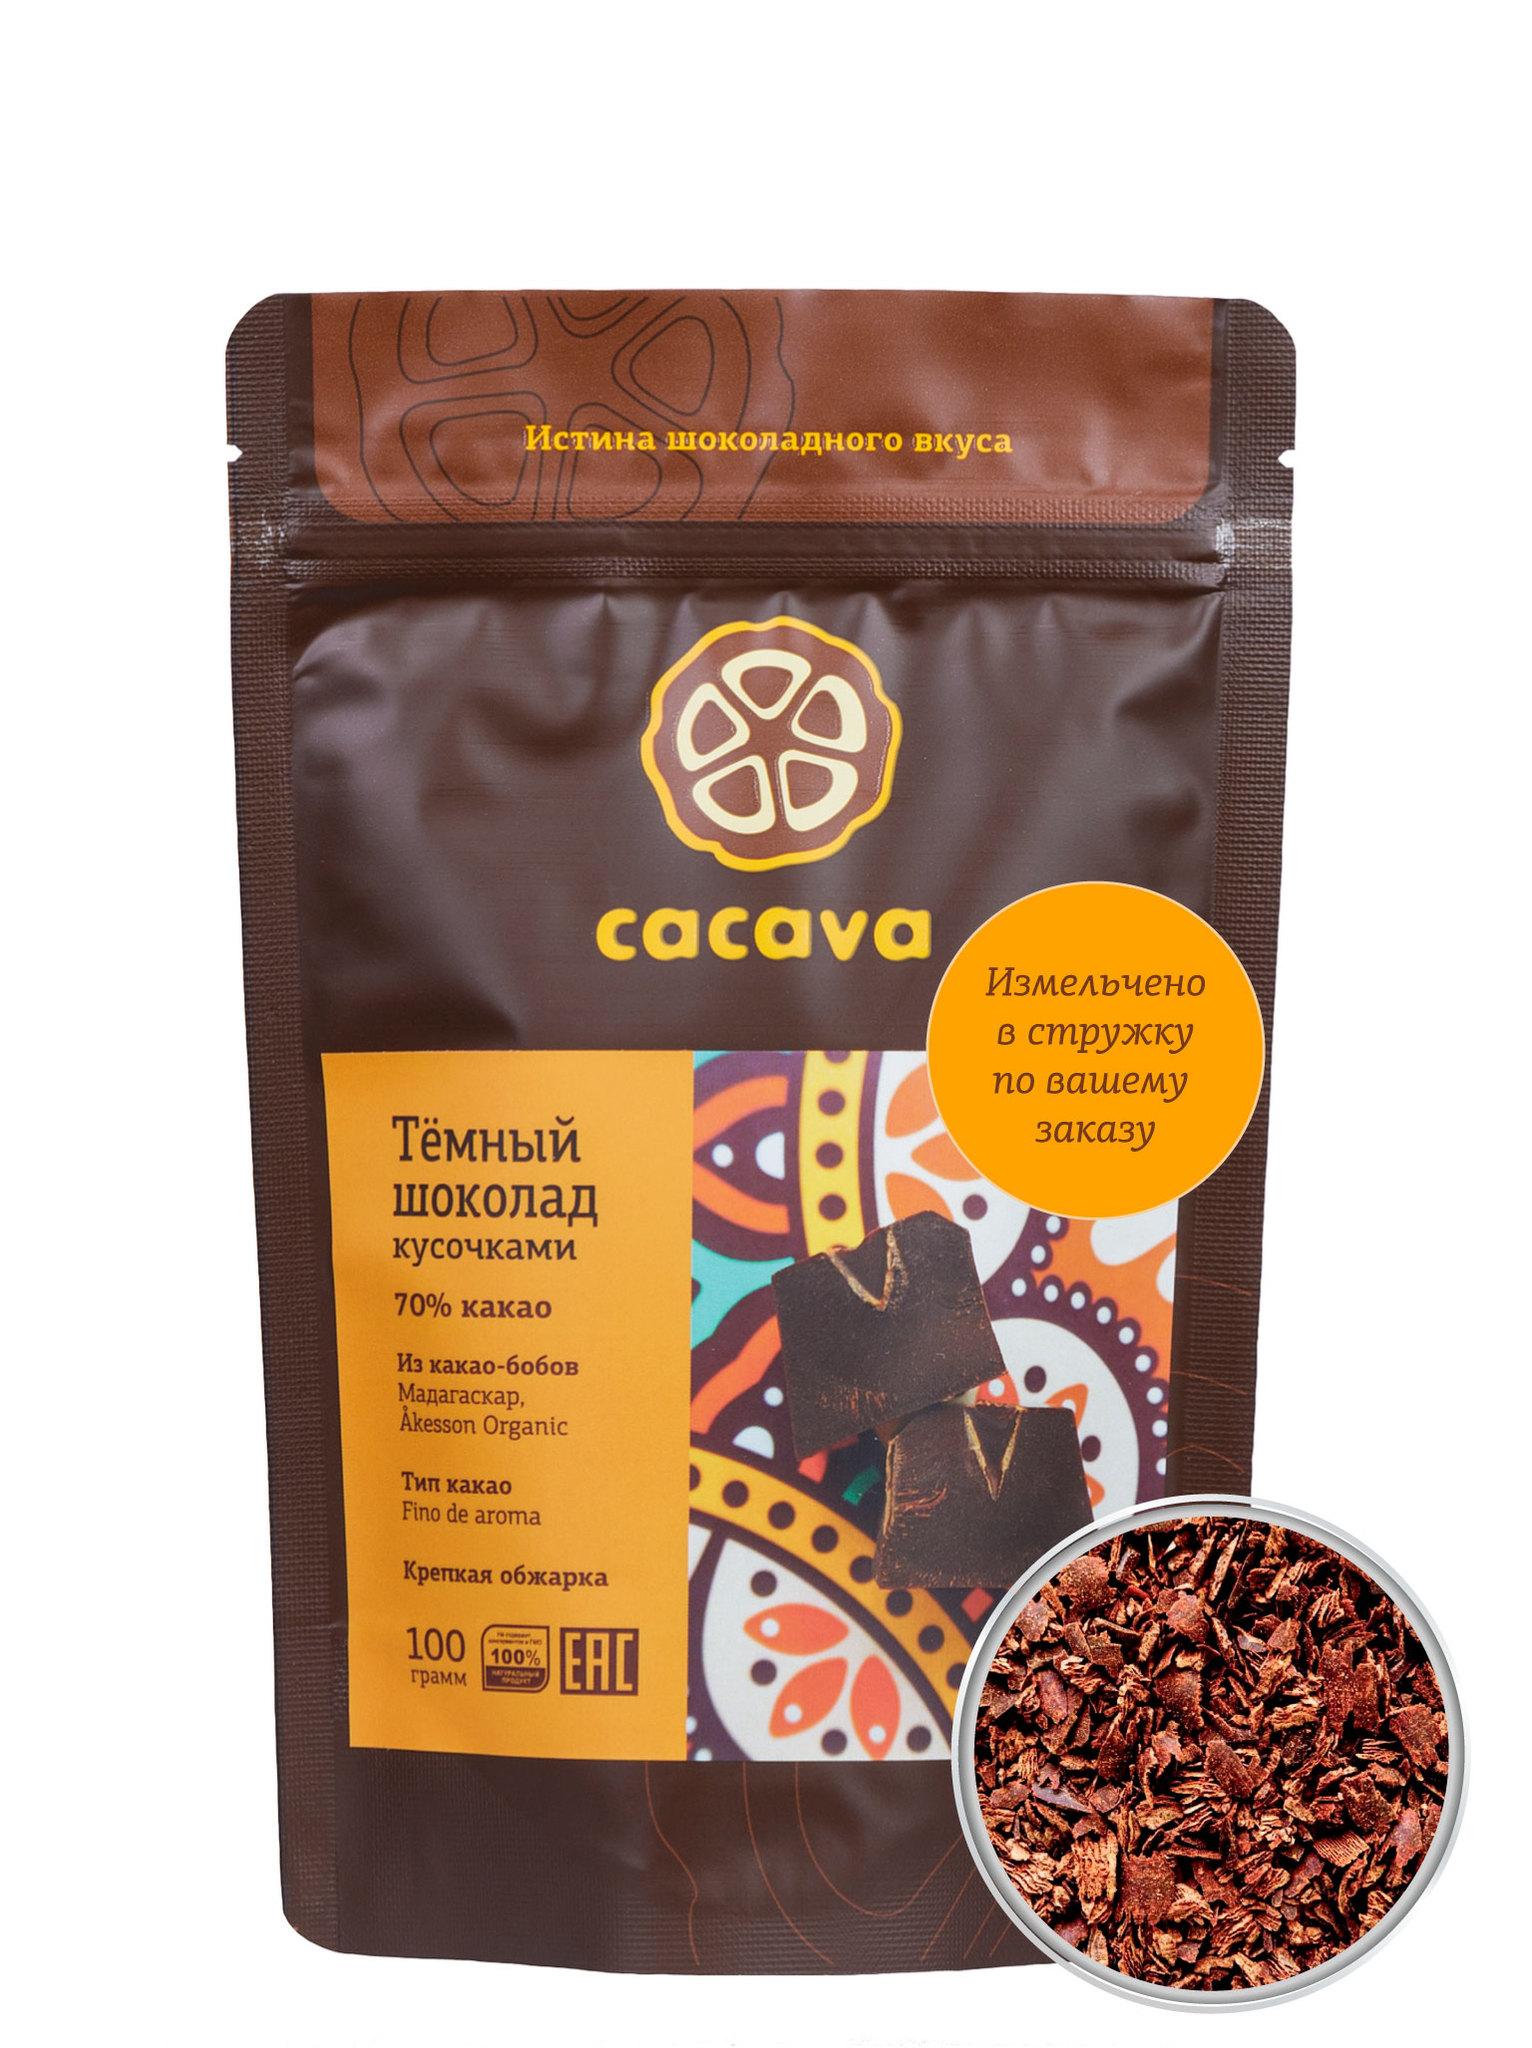 Тёмный шоколад 70 % какао в стружке (Мадагаскар, Åkesson), упаковка 100 грамм